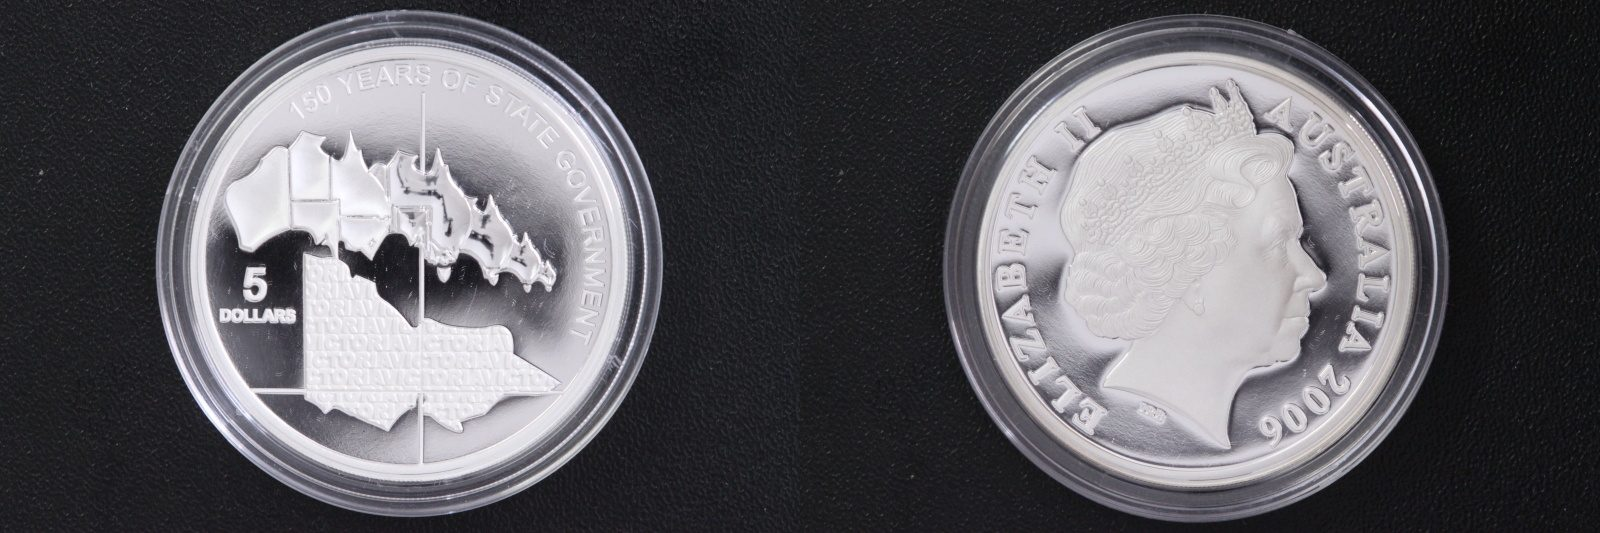 5 Dollar 2006 Australien 5$ - 150 Jahre Staatsregierung - Victoria PP/Etui/Zert